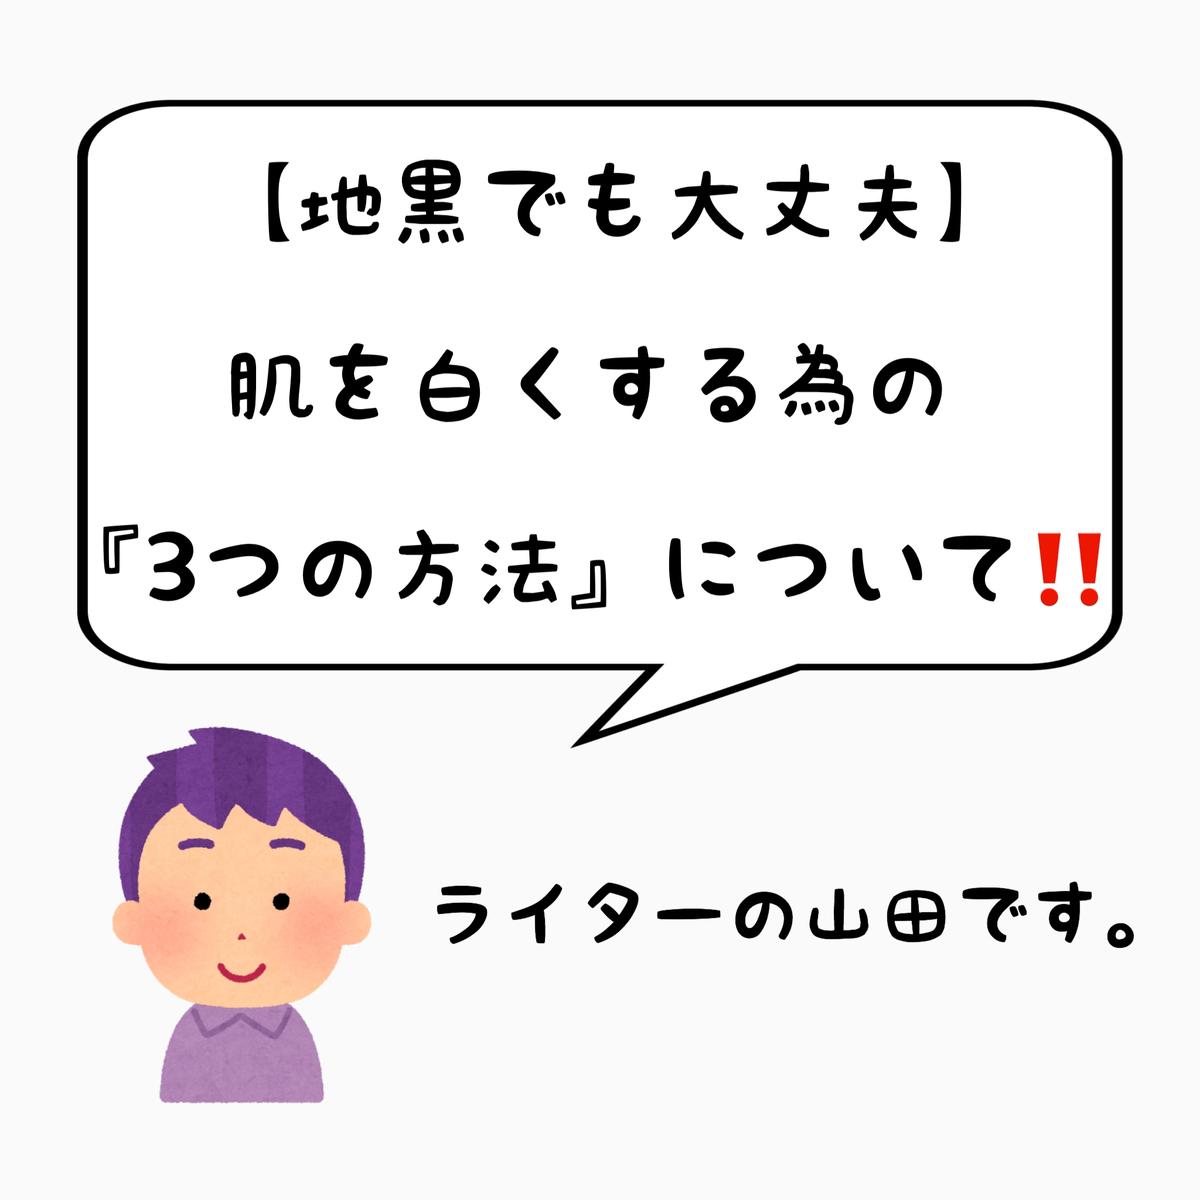 f:id:nokonoko_o:20201225145605j:plain